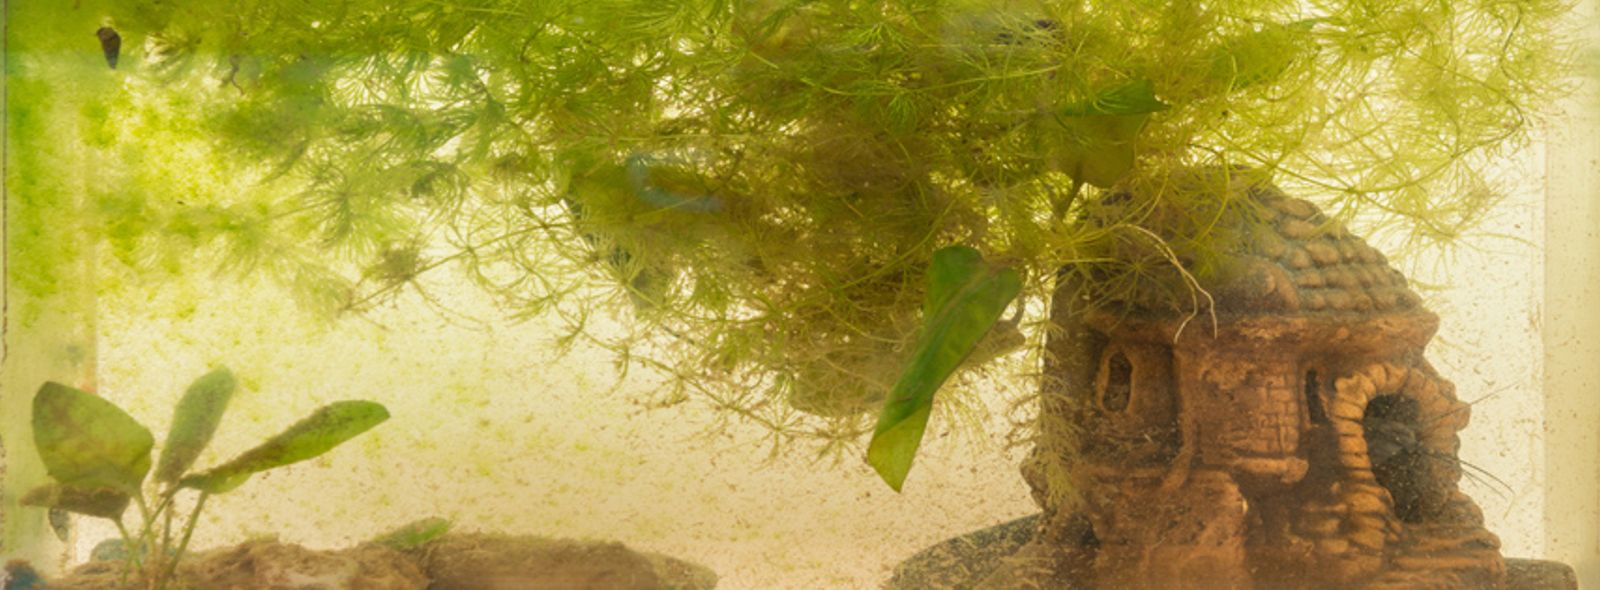 Alghe verdi filamentose